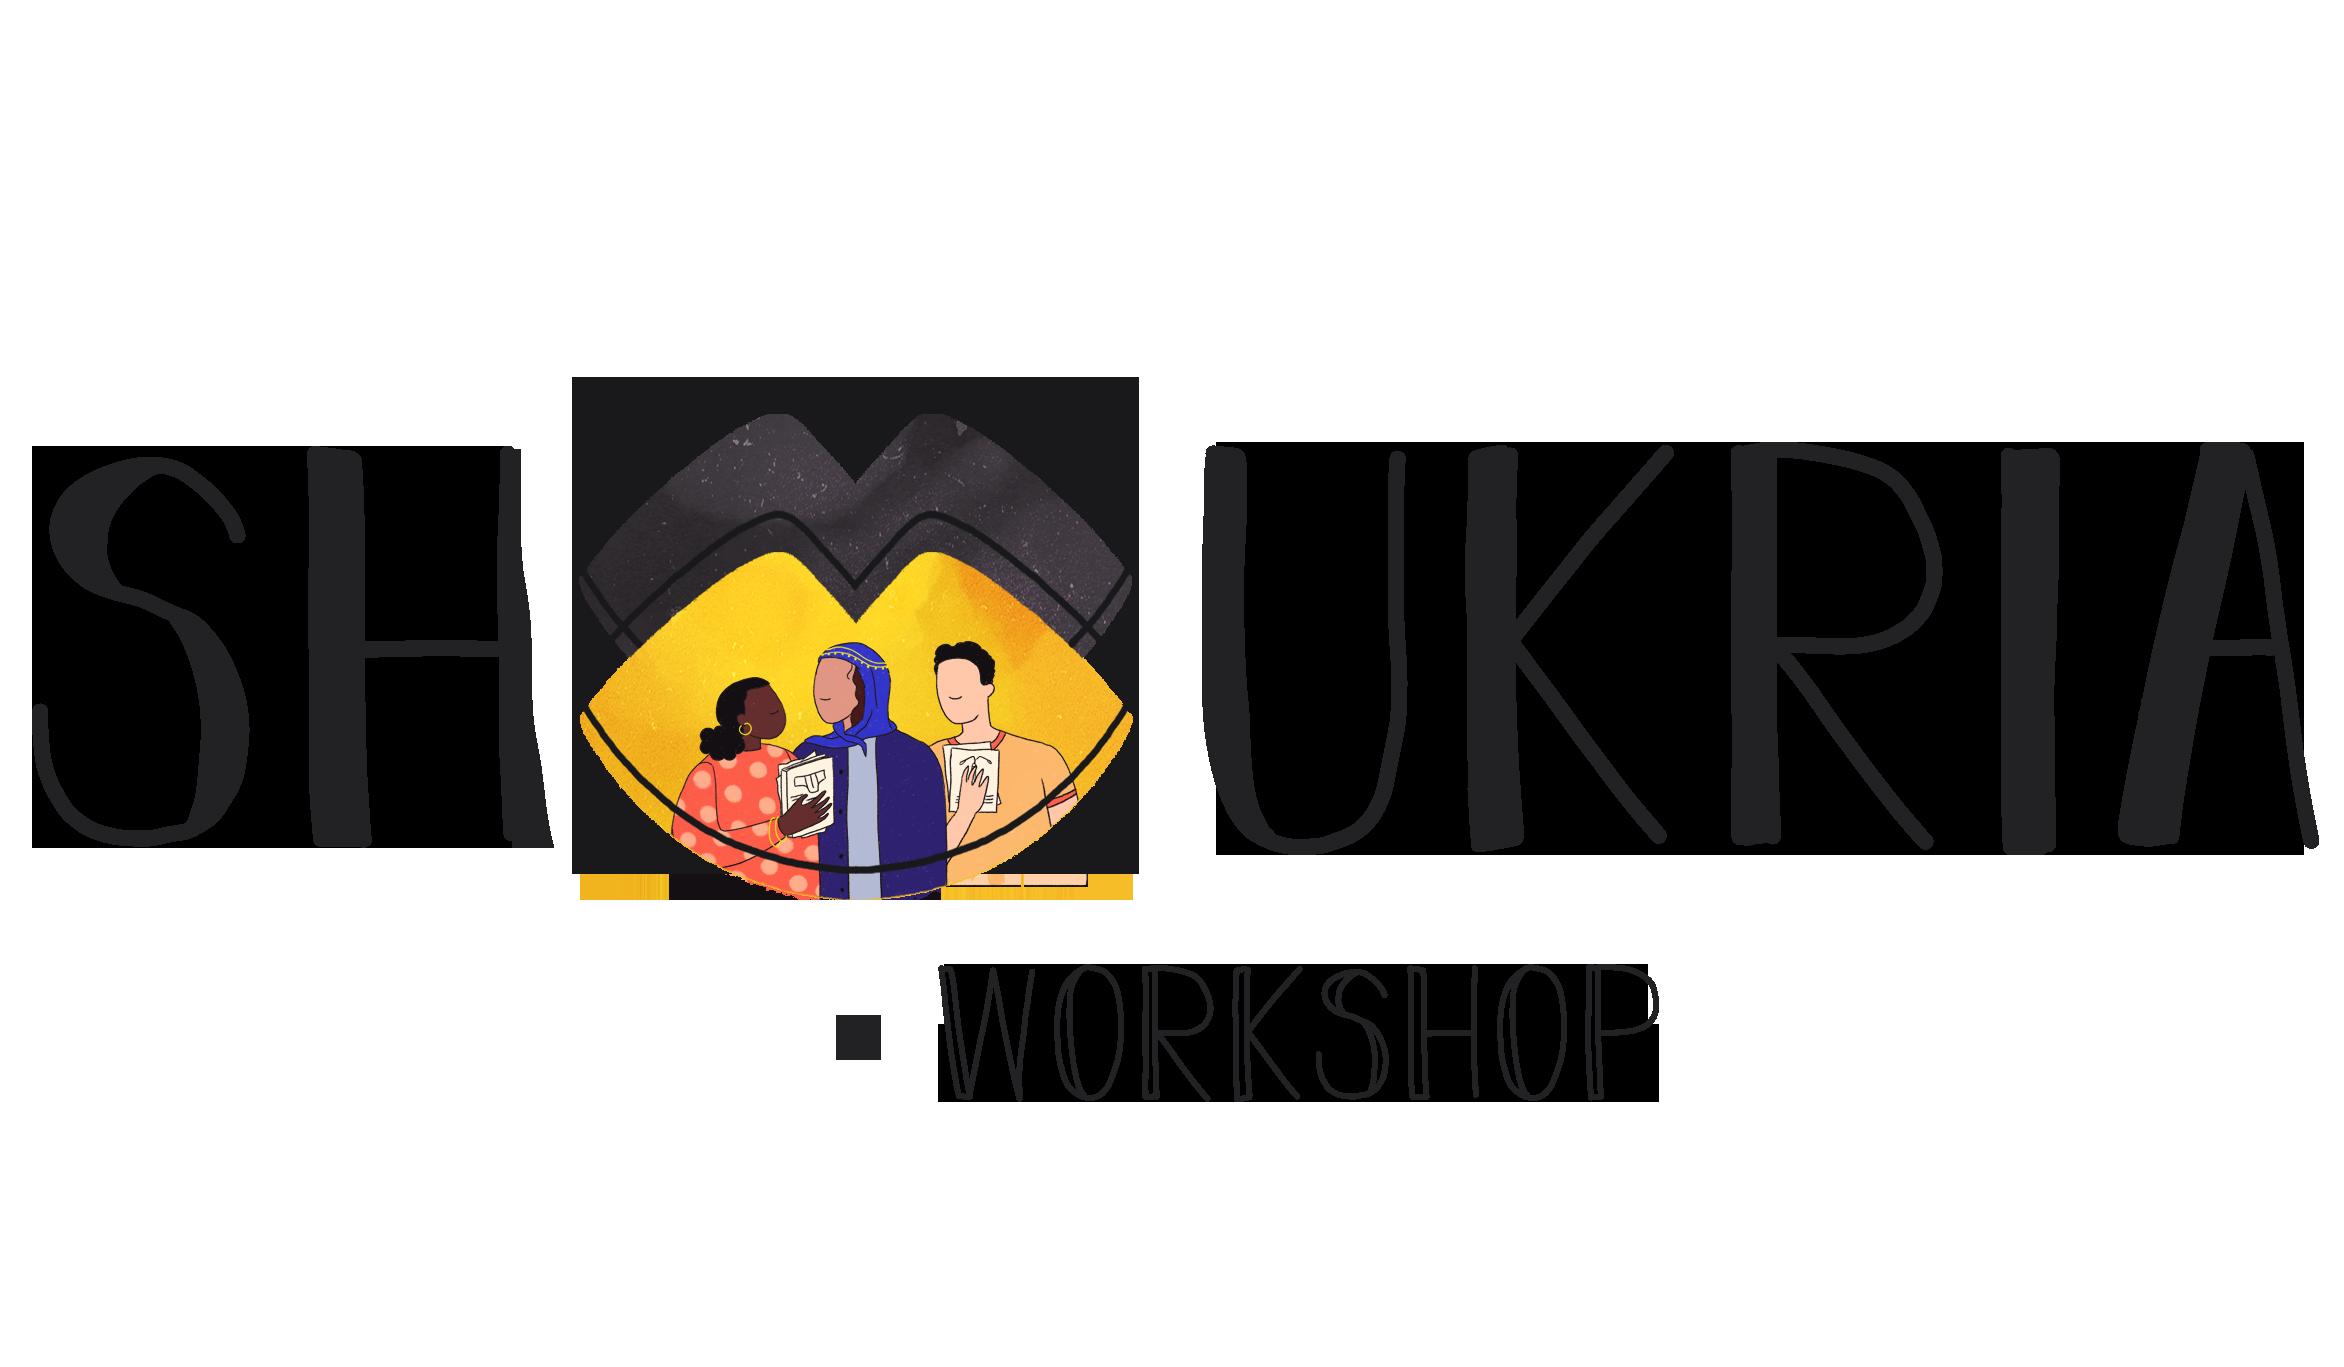 Shoukria Workshop Logo